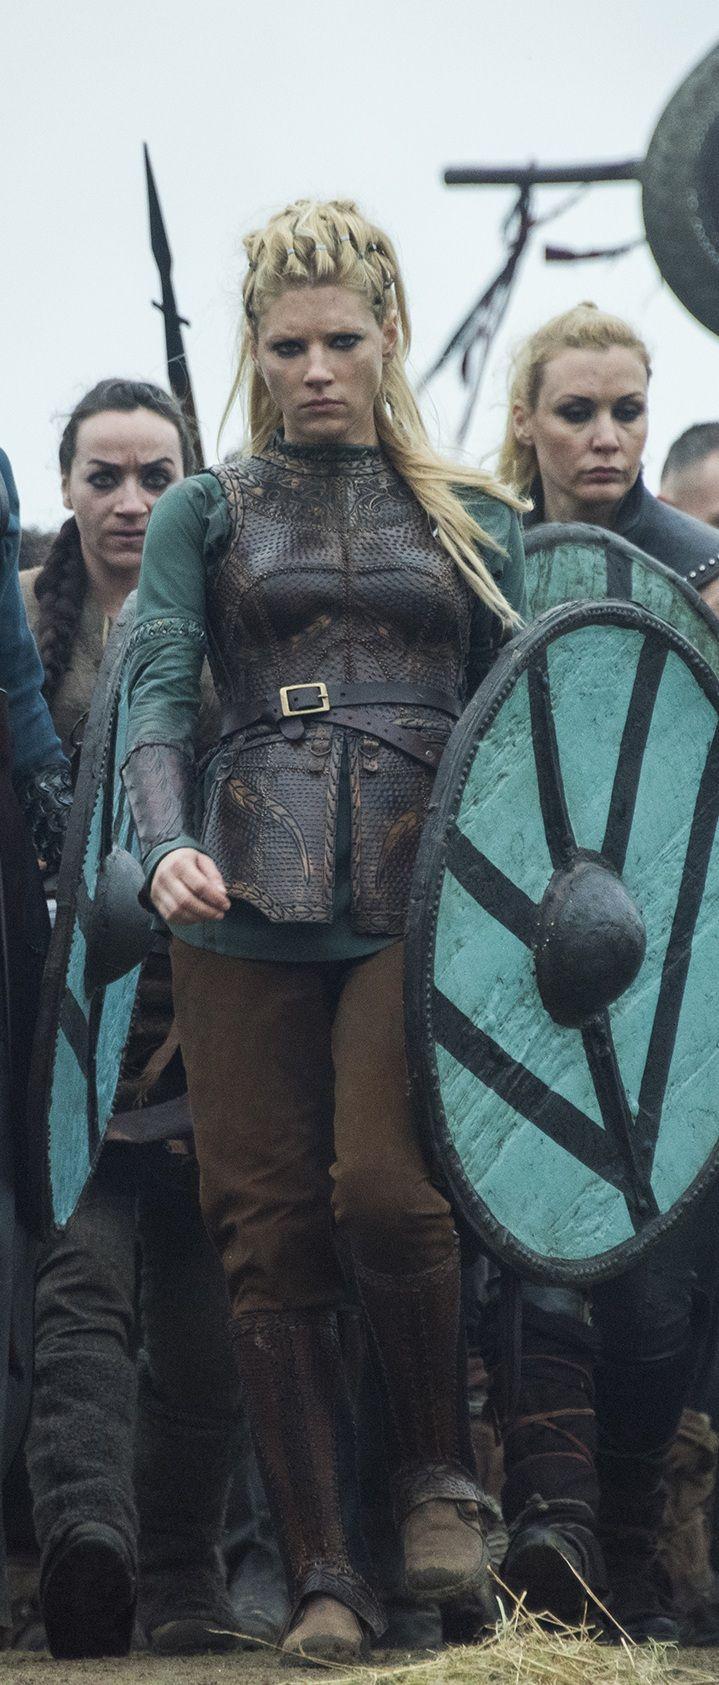 Lagertha - Ragnar Lothbrok's Wife #Lagertha #Vikings